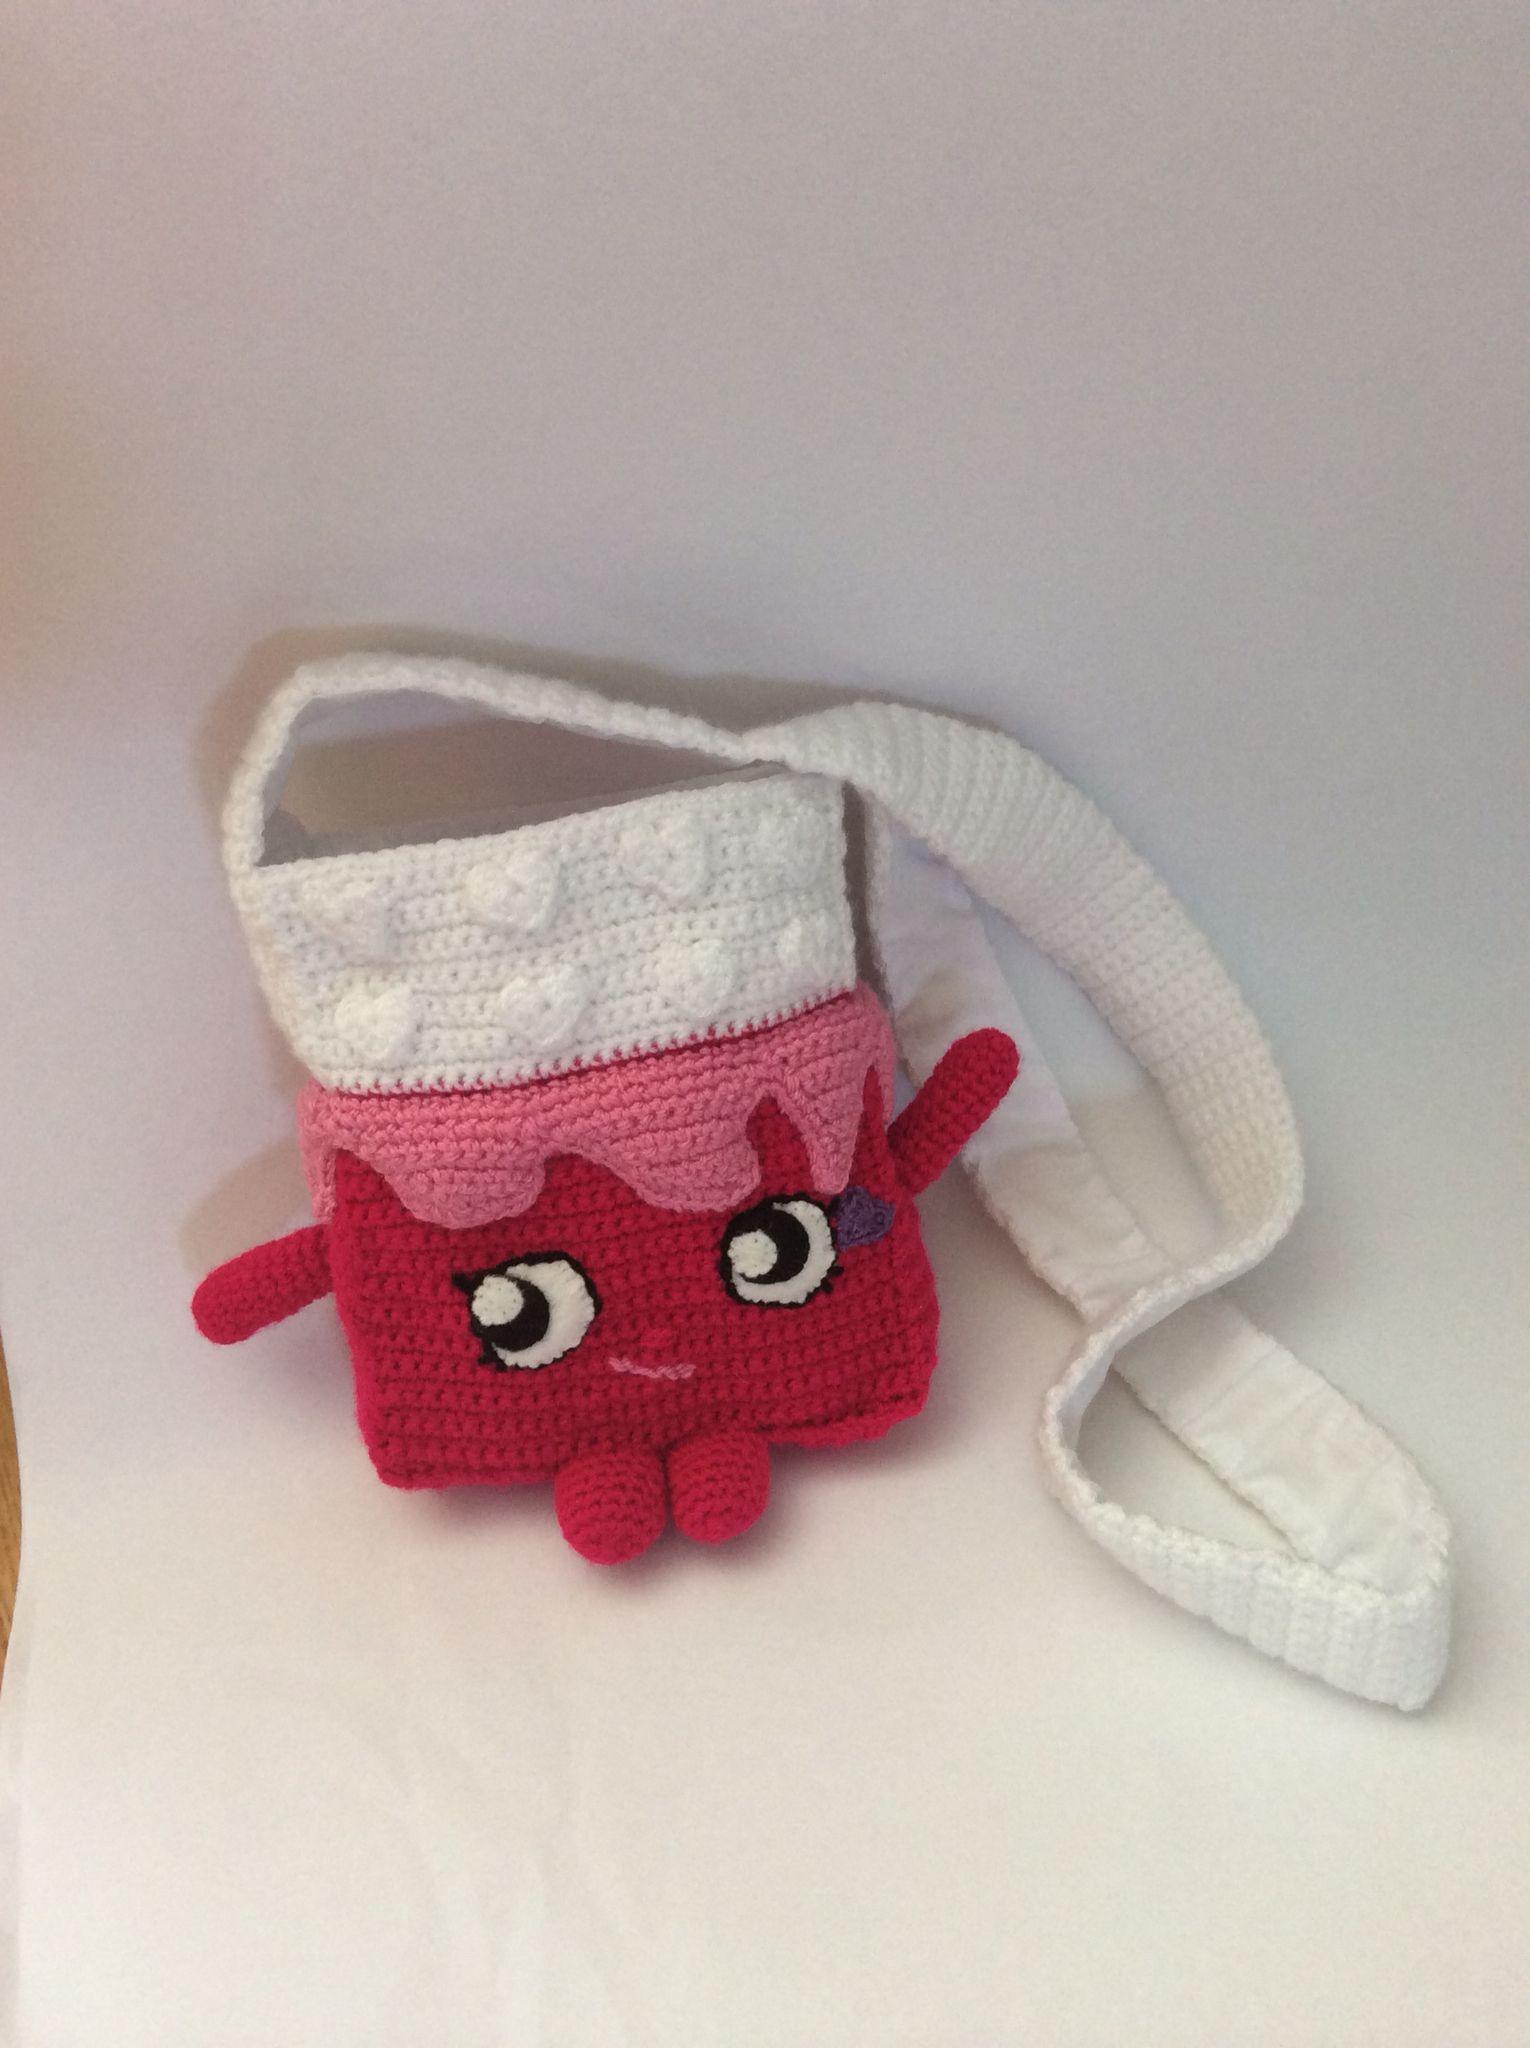 shopkins crochet pattern - Google Search | Shopkins | Pinterest ...